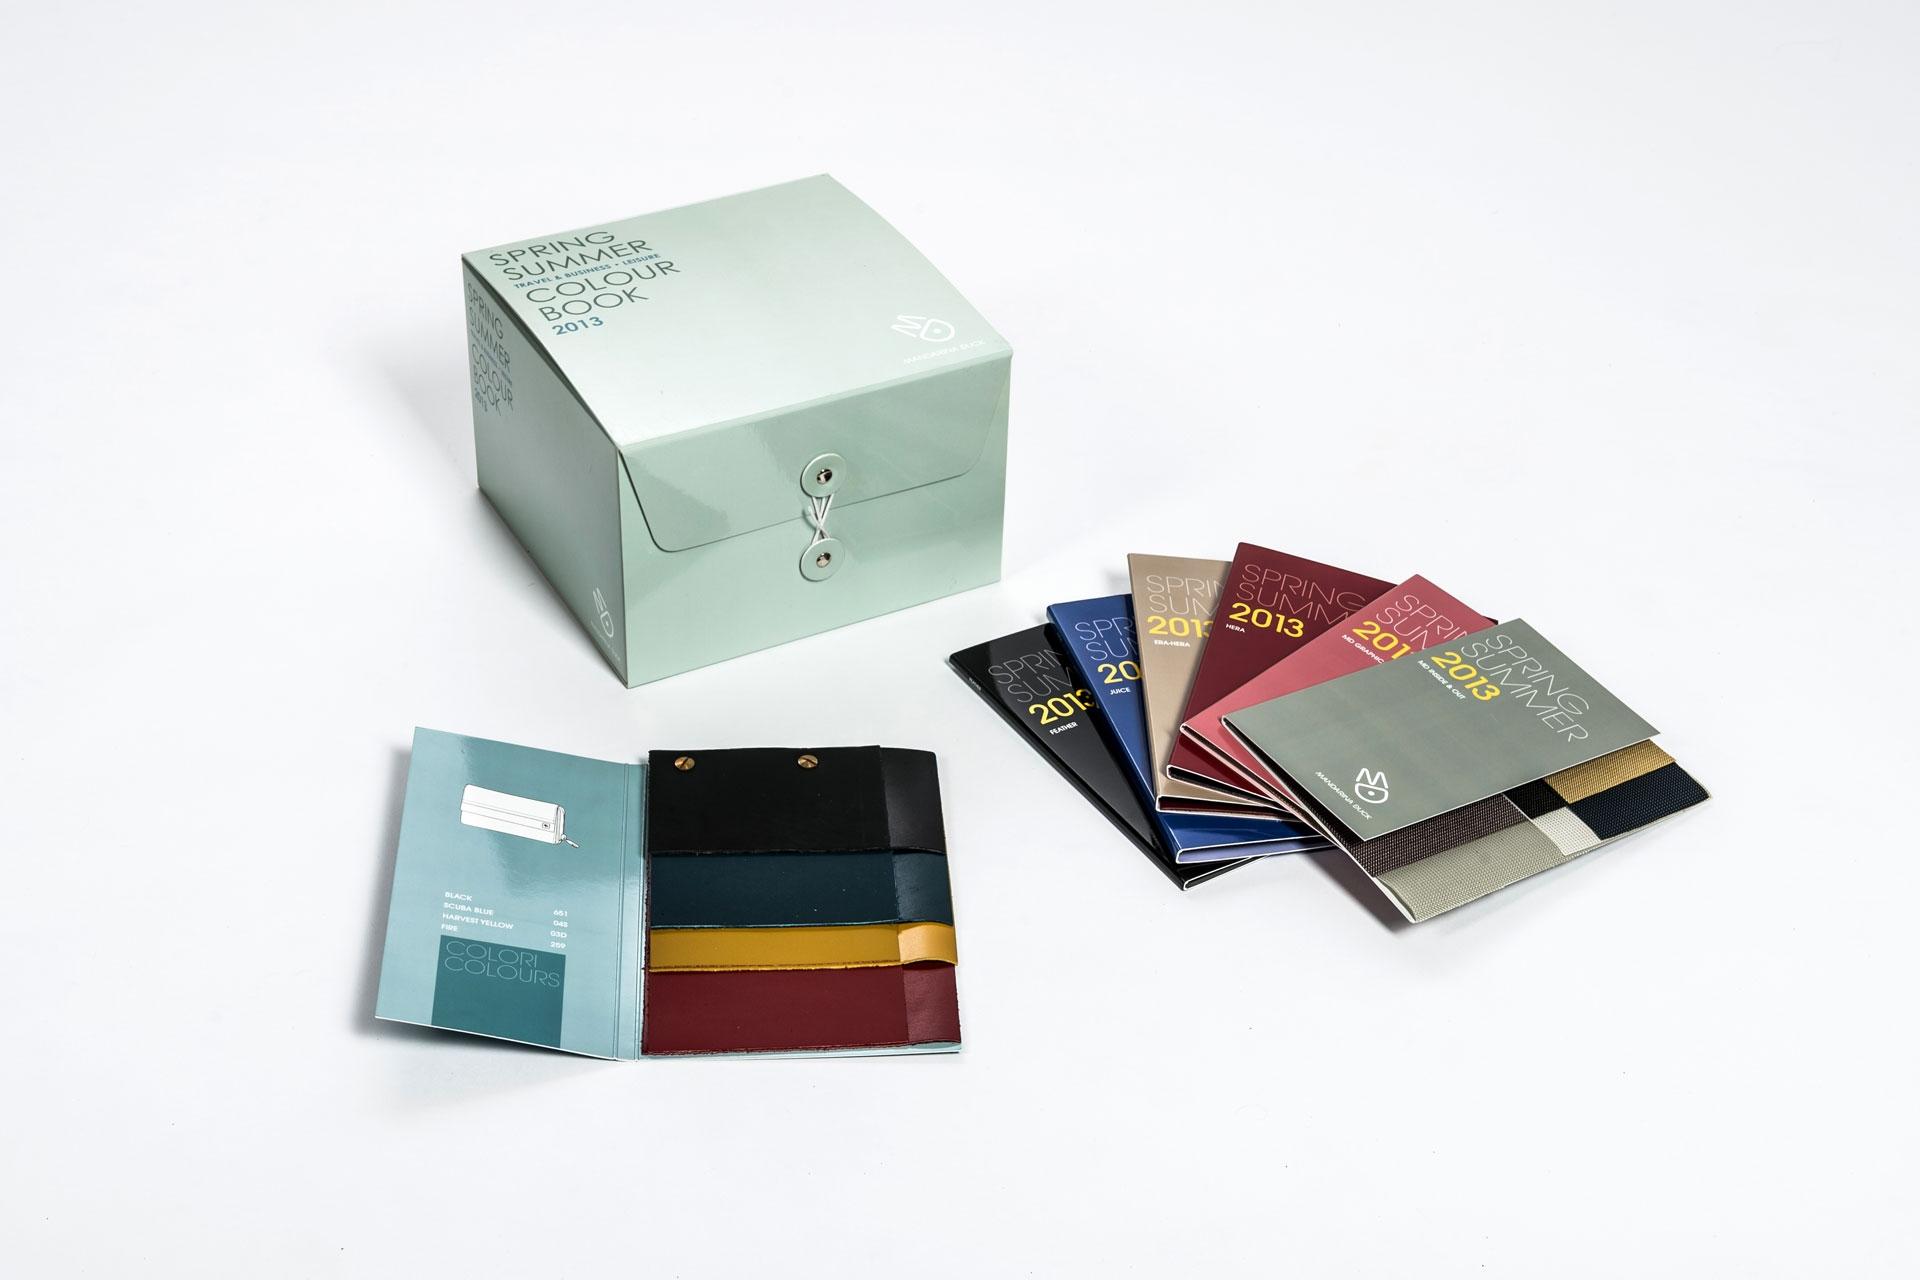 Espositore campioni | Mandarina Duck - Centroffset stampa, packaging, grafica